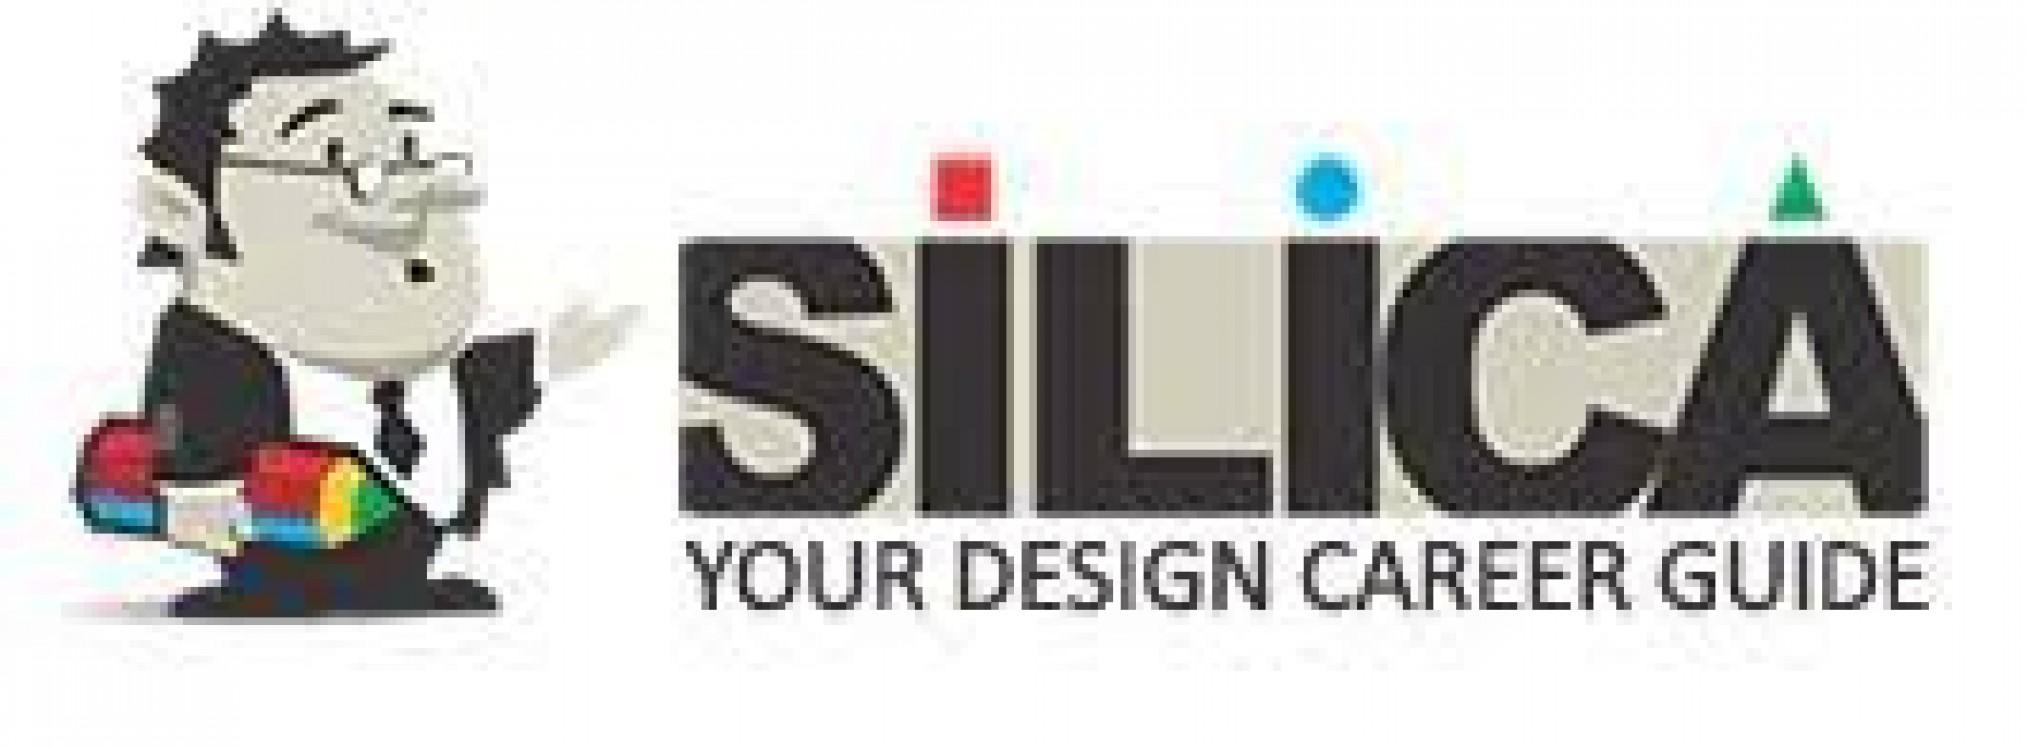 SILICA Indore: Design Career Guide